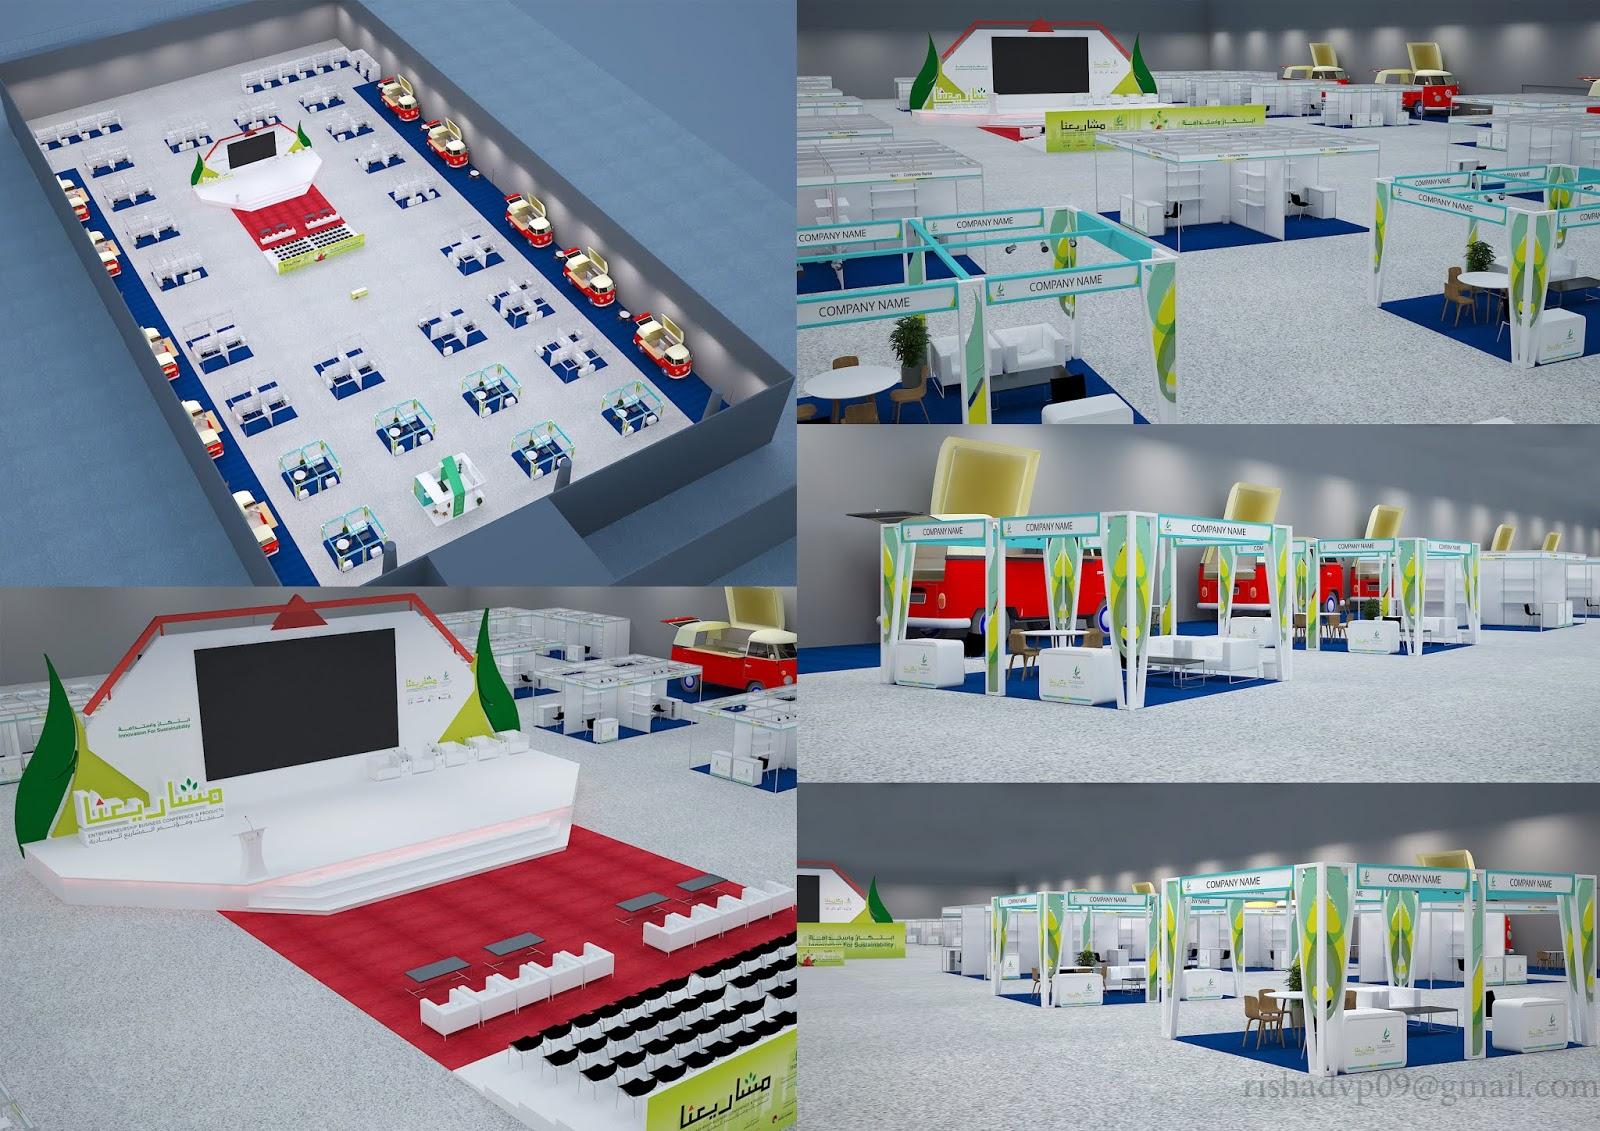 Exhibition Stand Designer Vacancy In Dubai : Rishadvp exhibition stands design